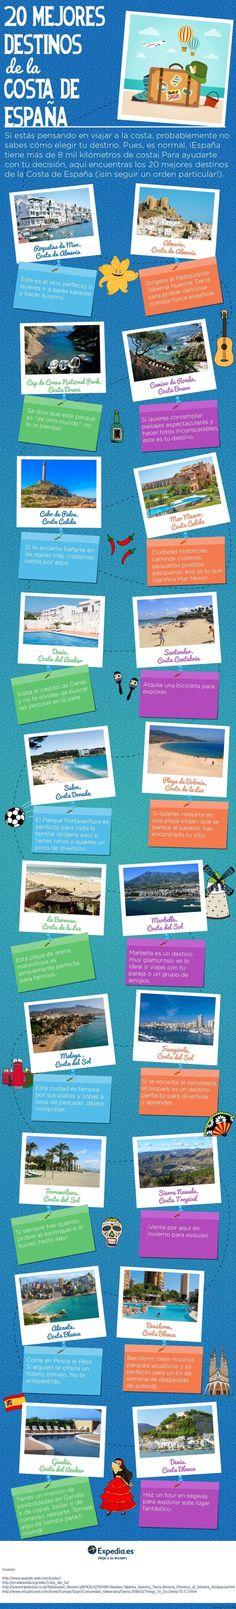 20 mejores destinos de la costa de España #infografia